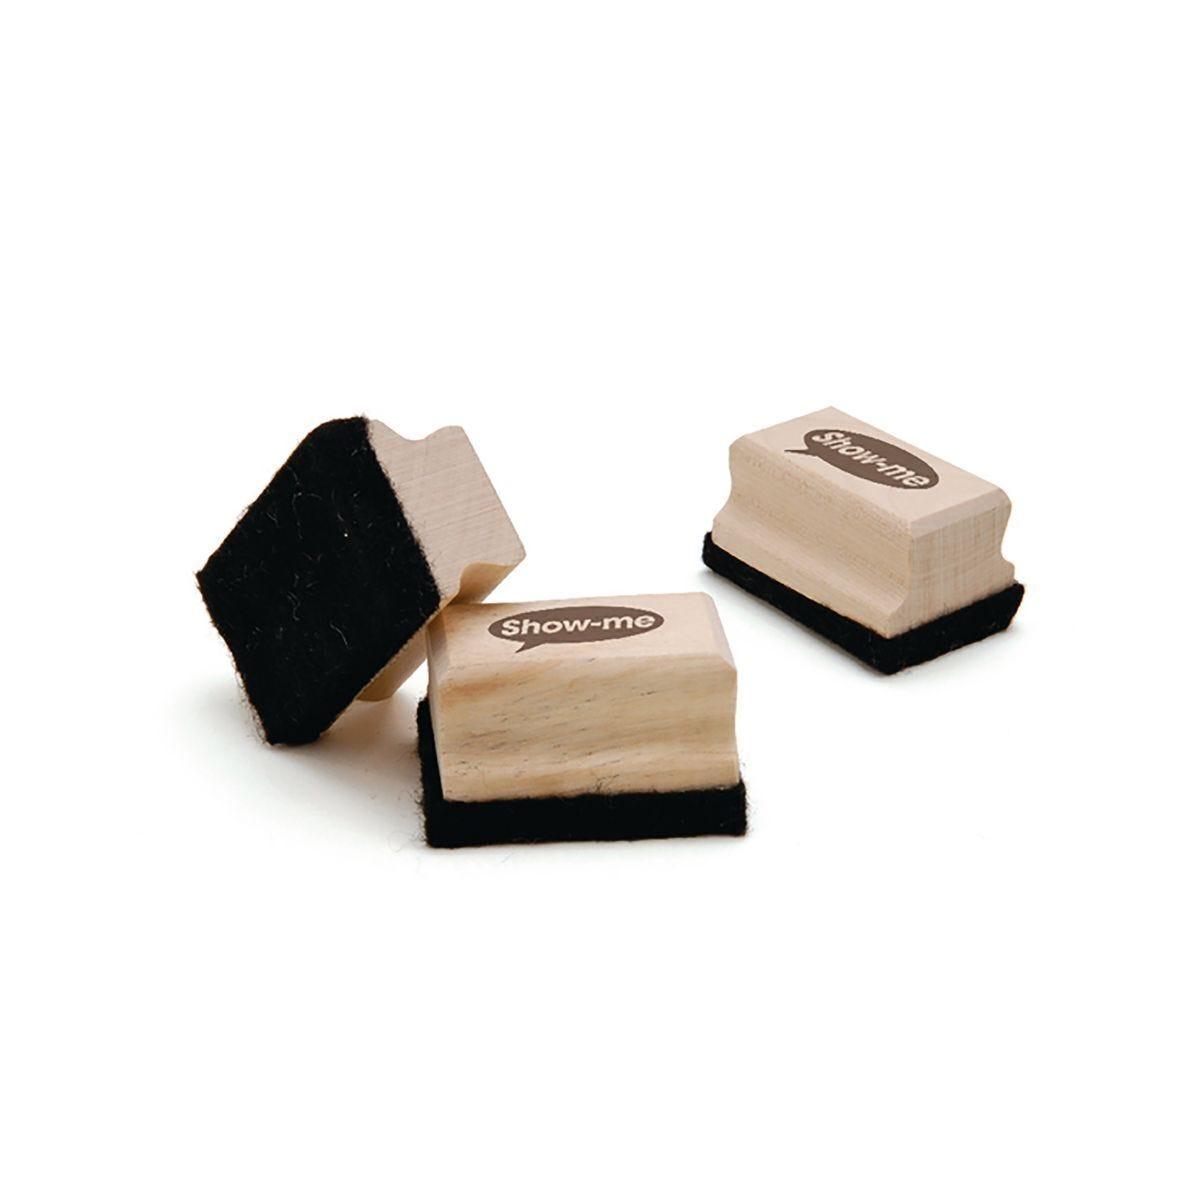 Show-me Wooden Handle Board Eraser Pack of 30